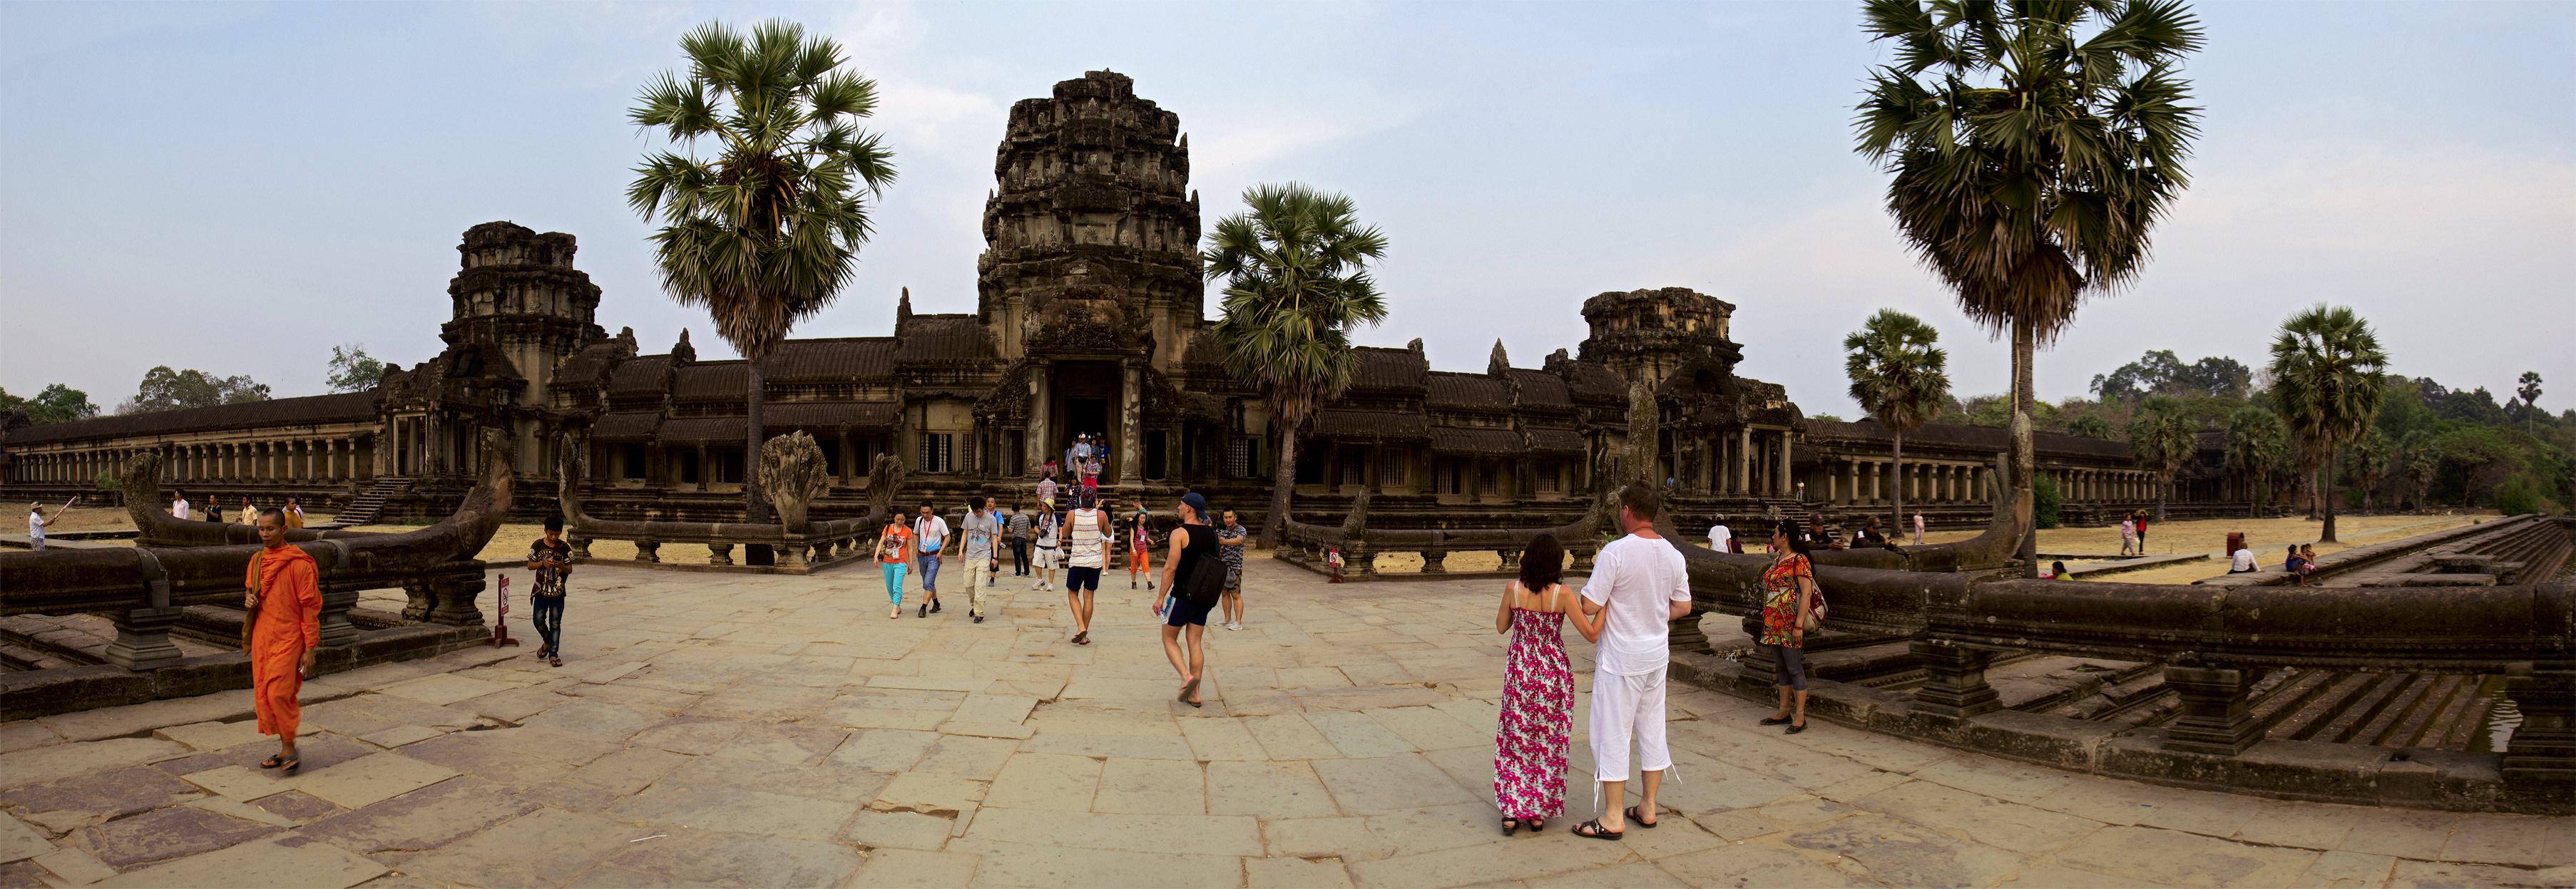 Панорама_Анкор Ват-